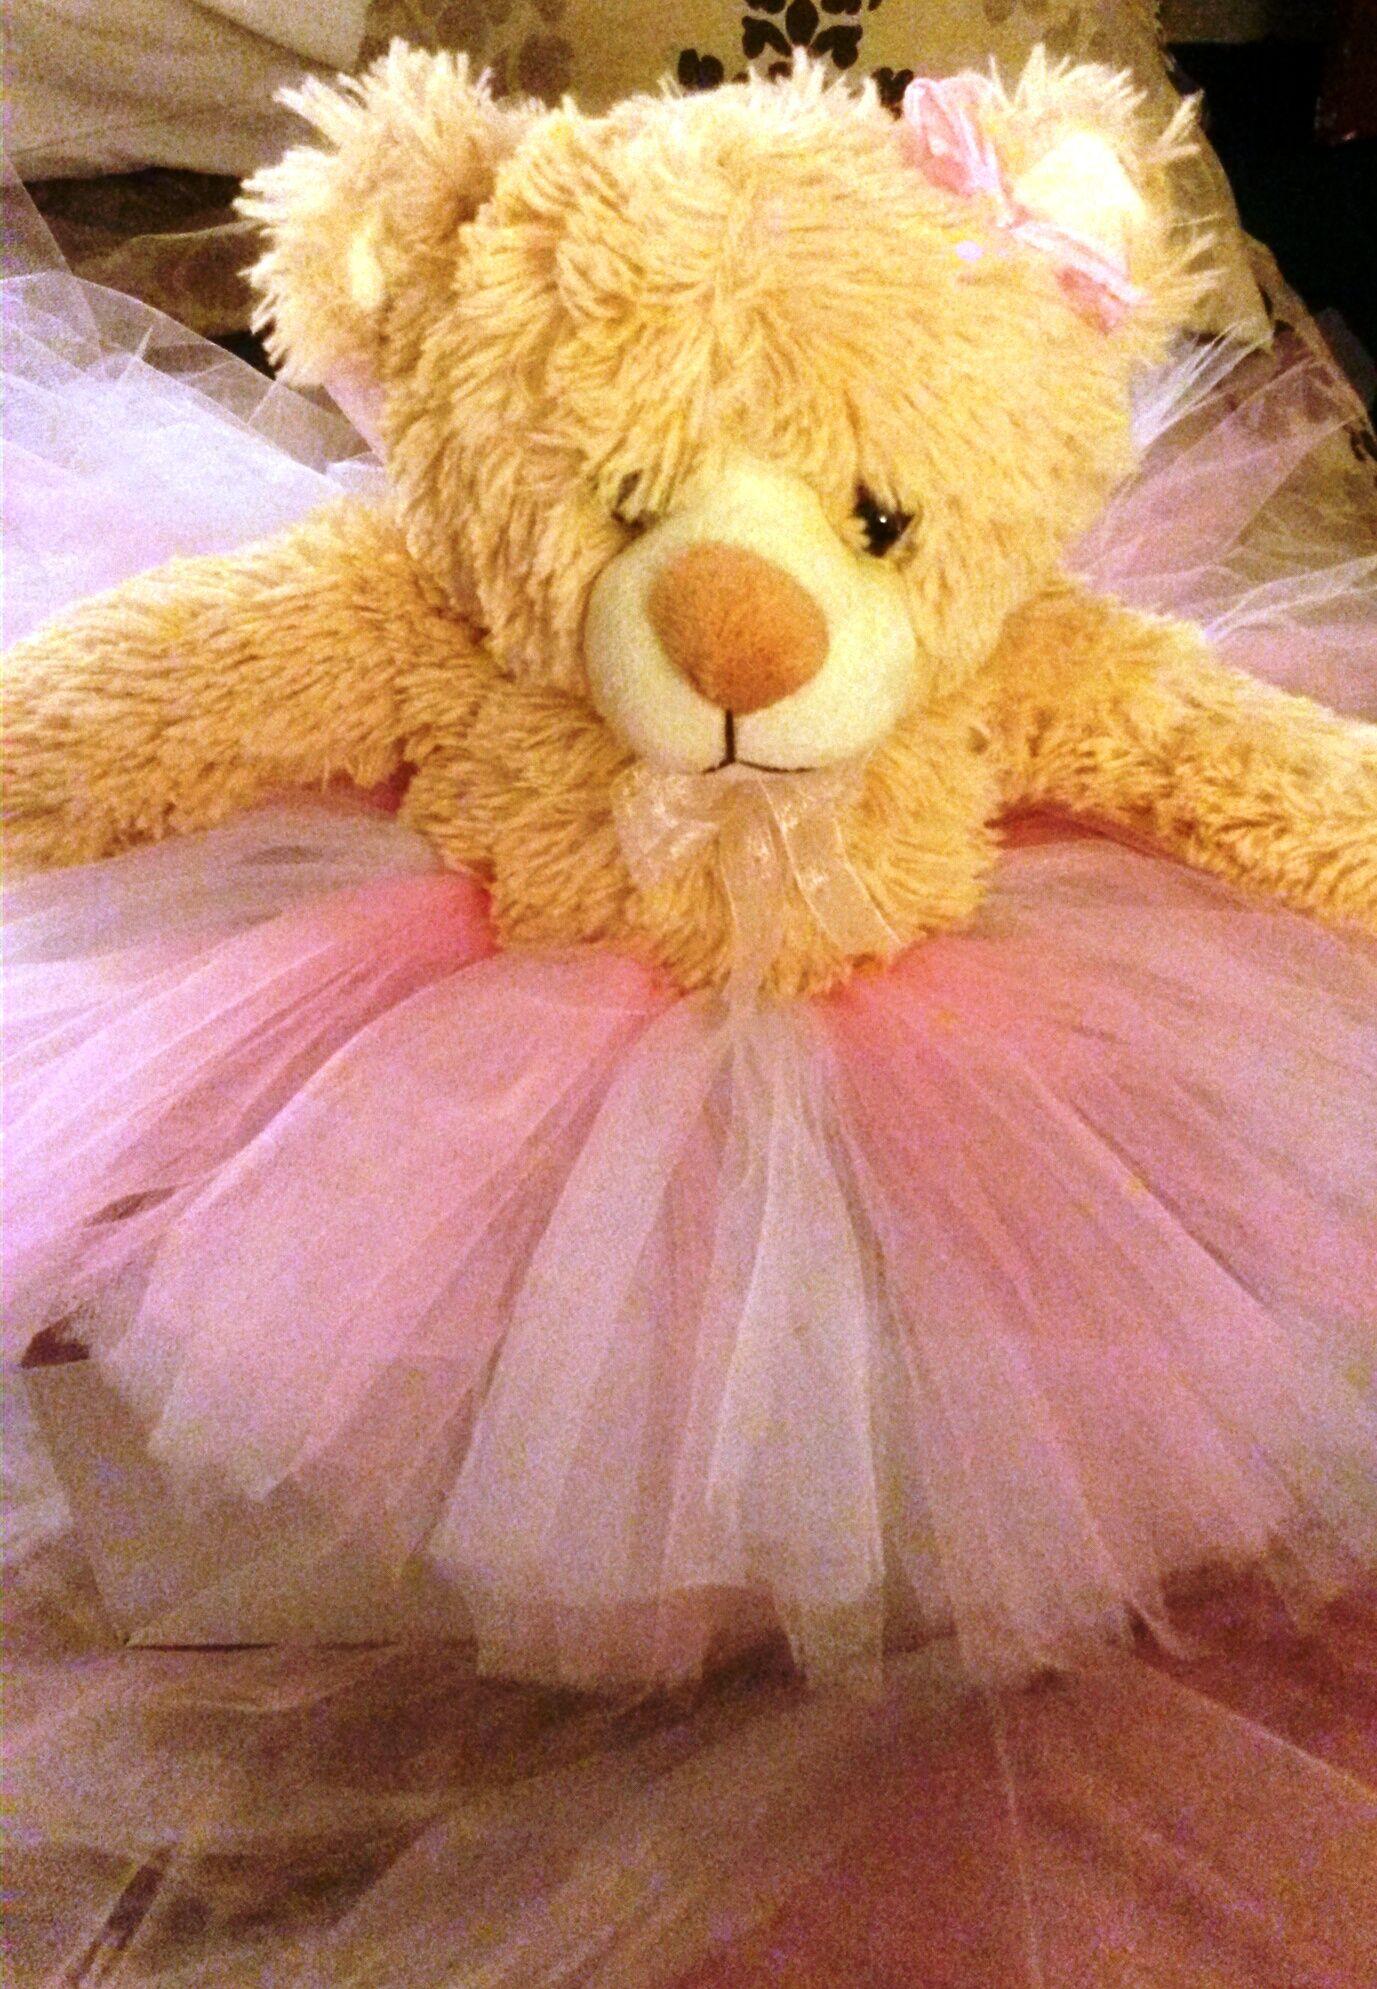 Teddy bears with custom tutus gifts new baby or gift for toddler teddy bears with custom tutus gifts new baby or gift for toddler negle Images